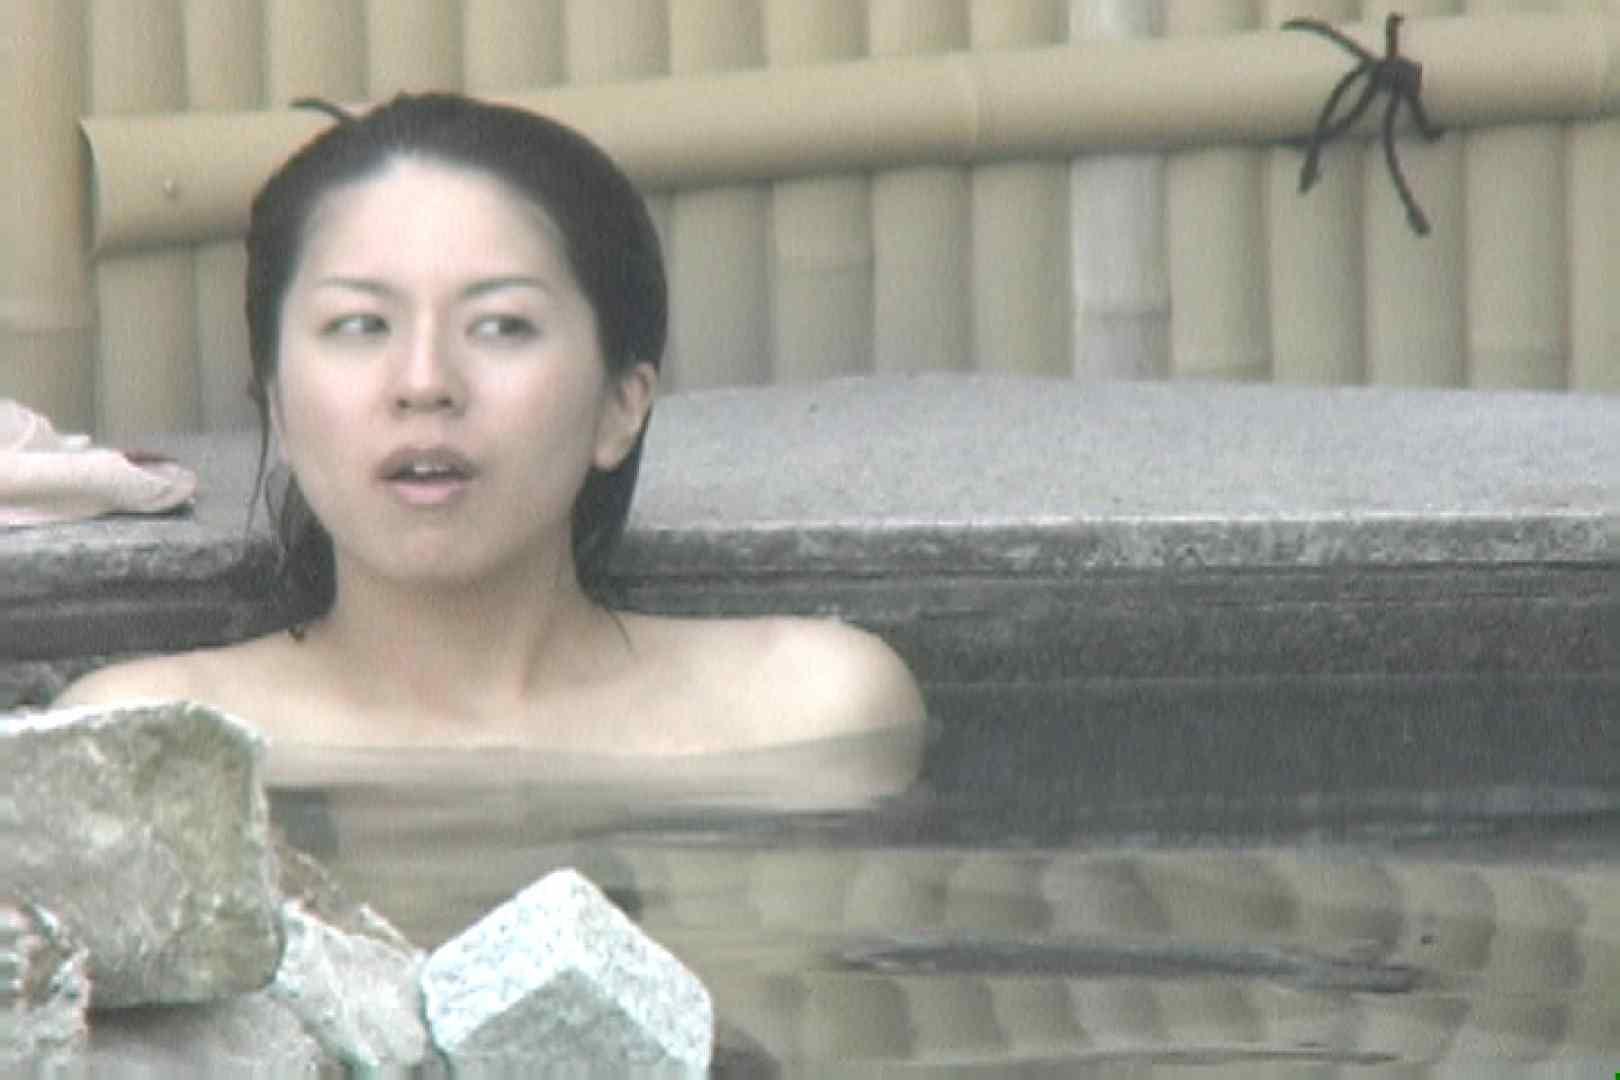 Aquaな露天風呂Vol.694 エロいOL オメコ動画キャプチャ 110枚